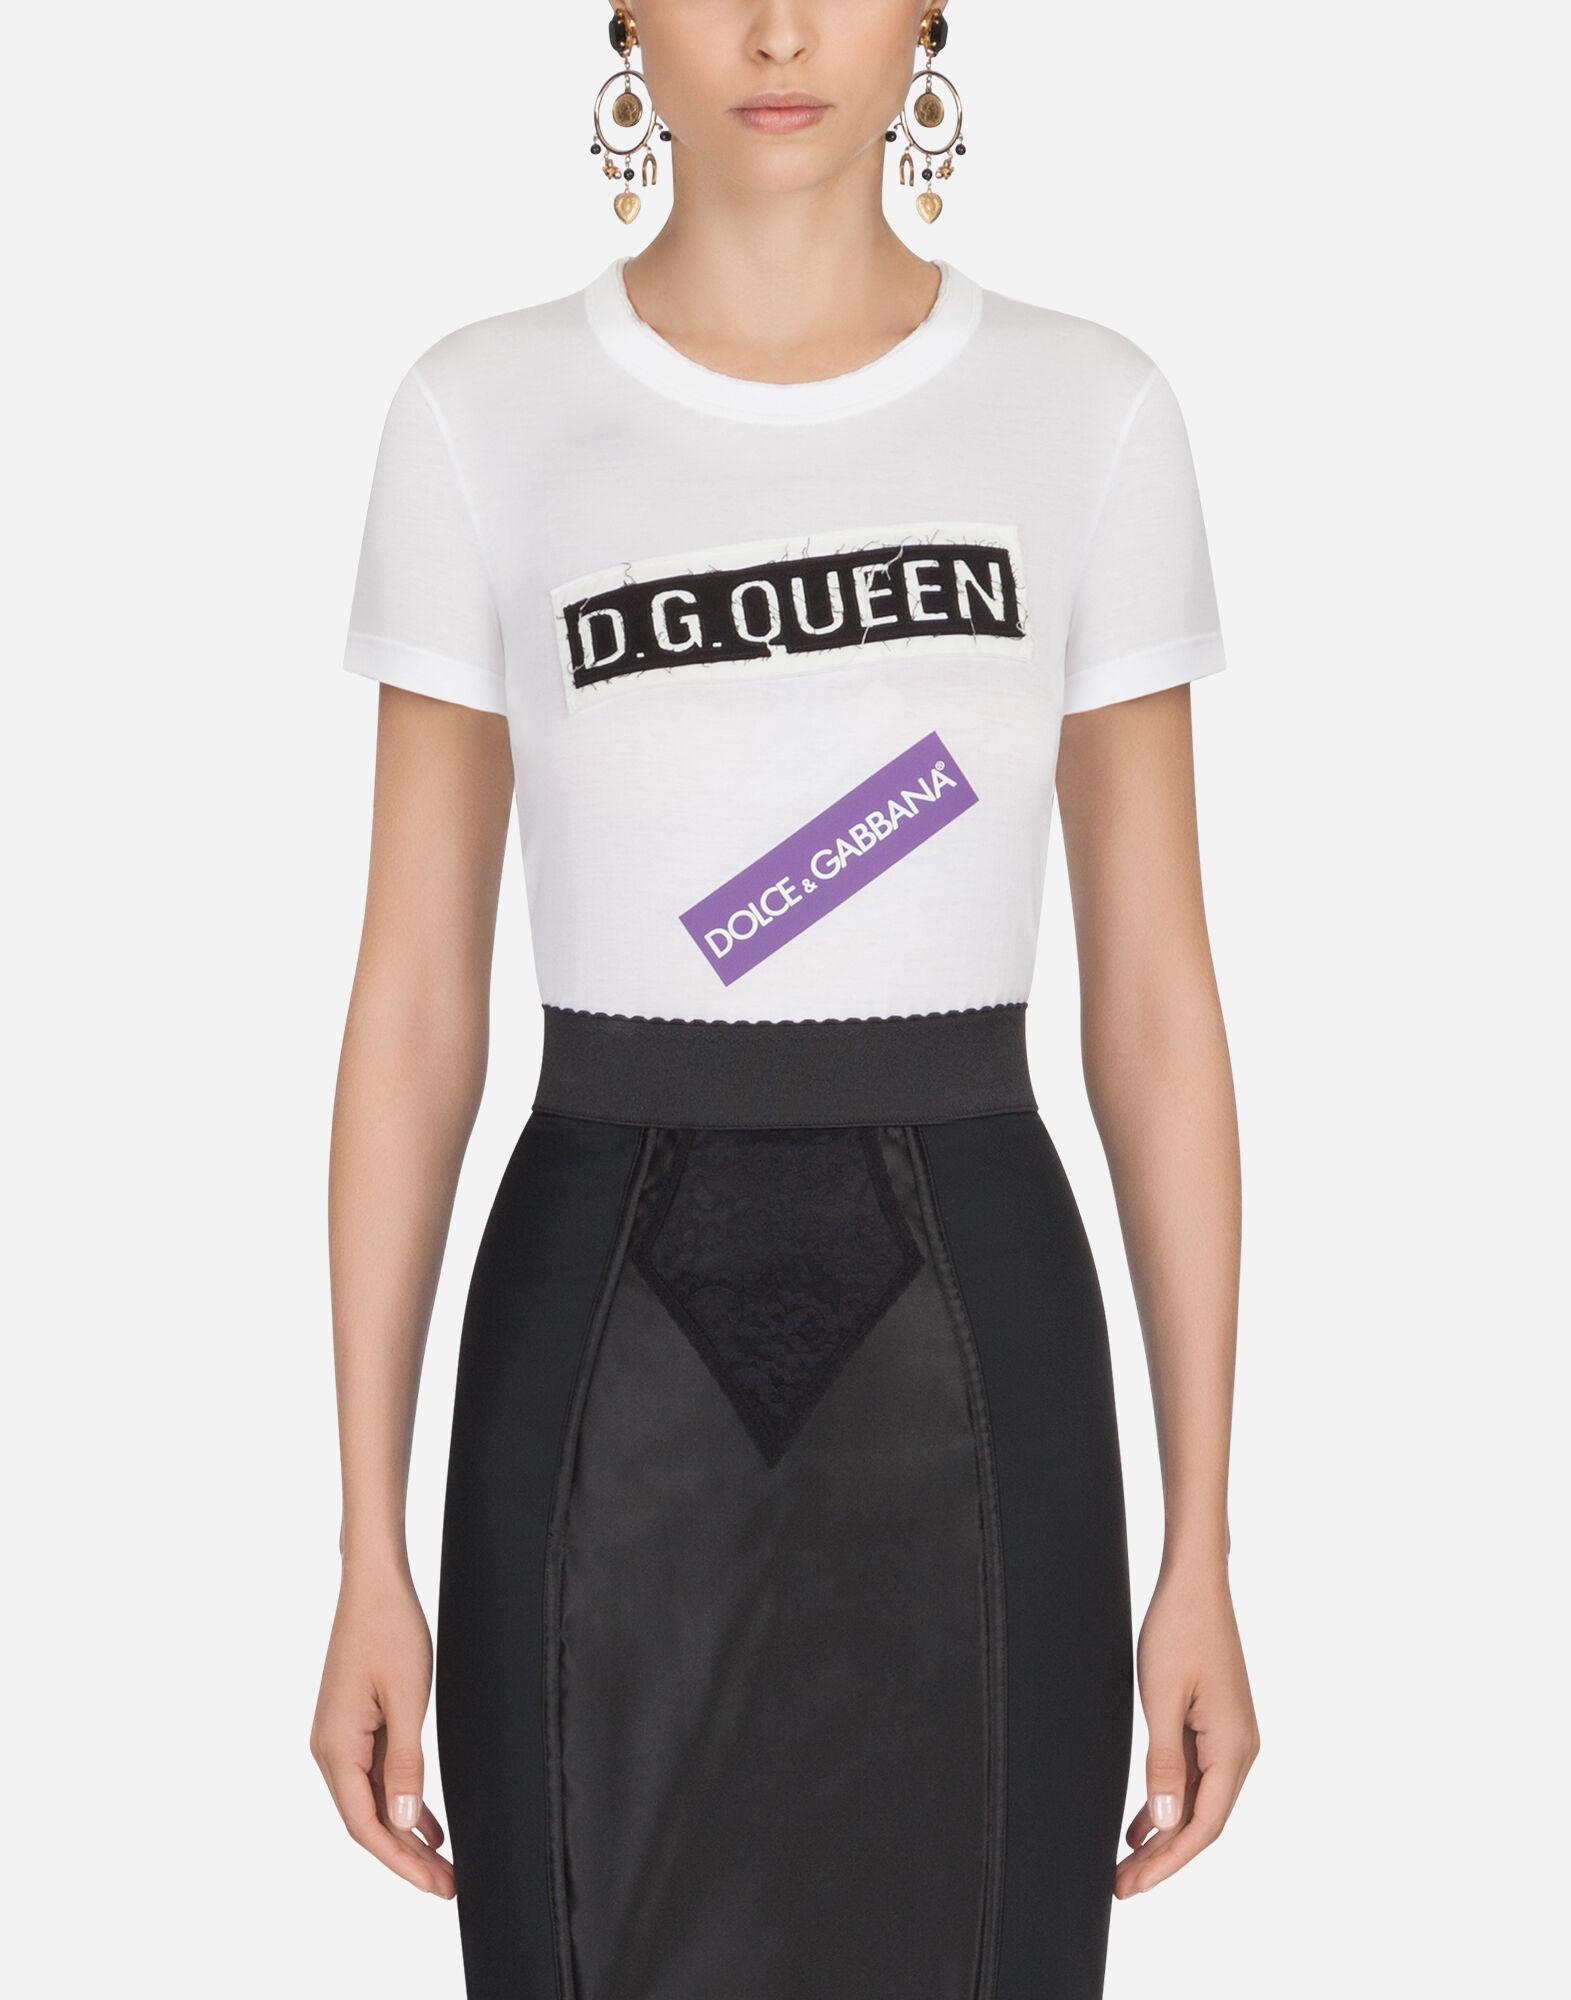 Dolce And Women's T Sweatshirts amp;gabbana Shirts qz1IExwO1